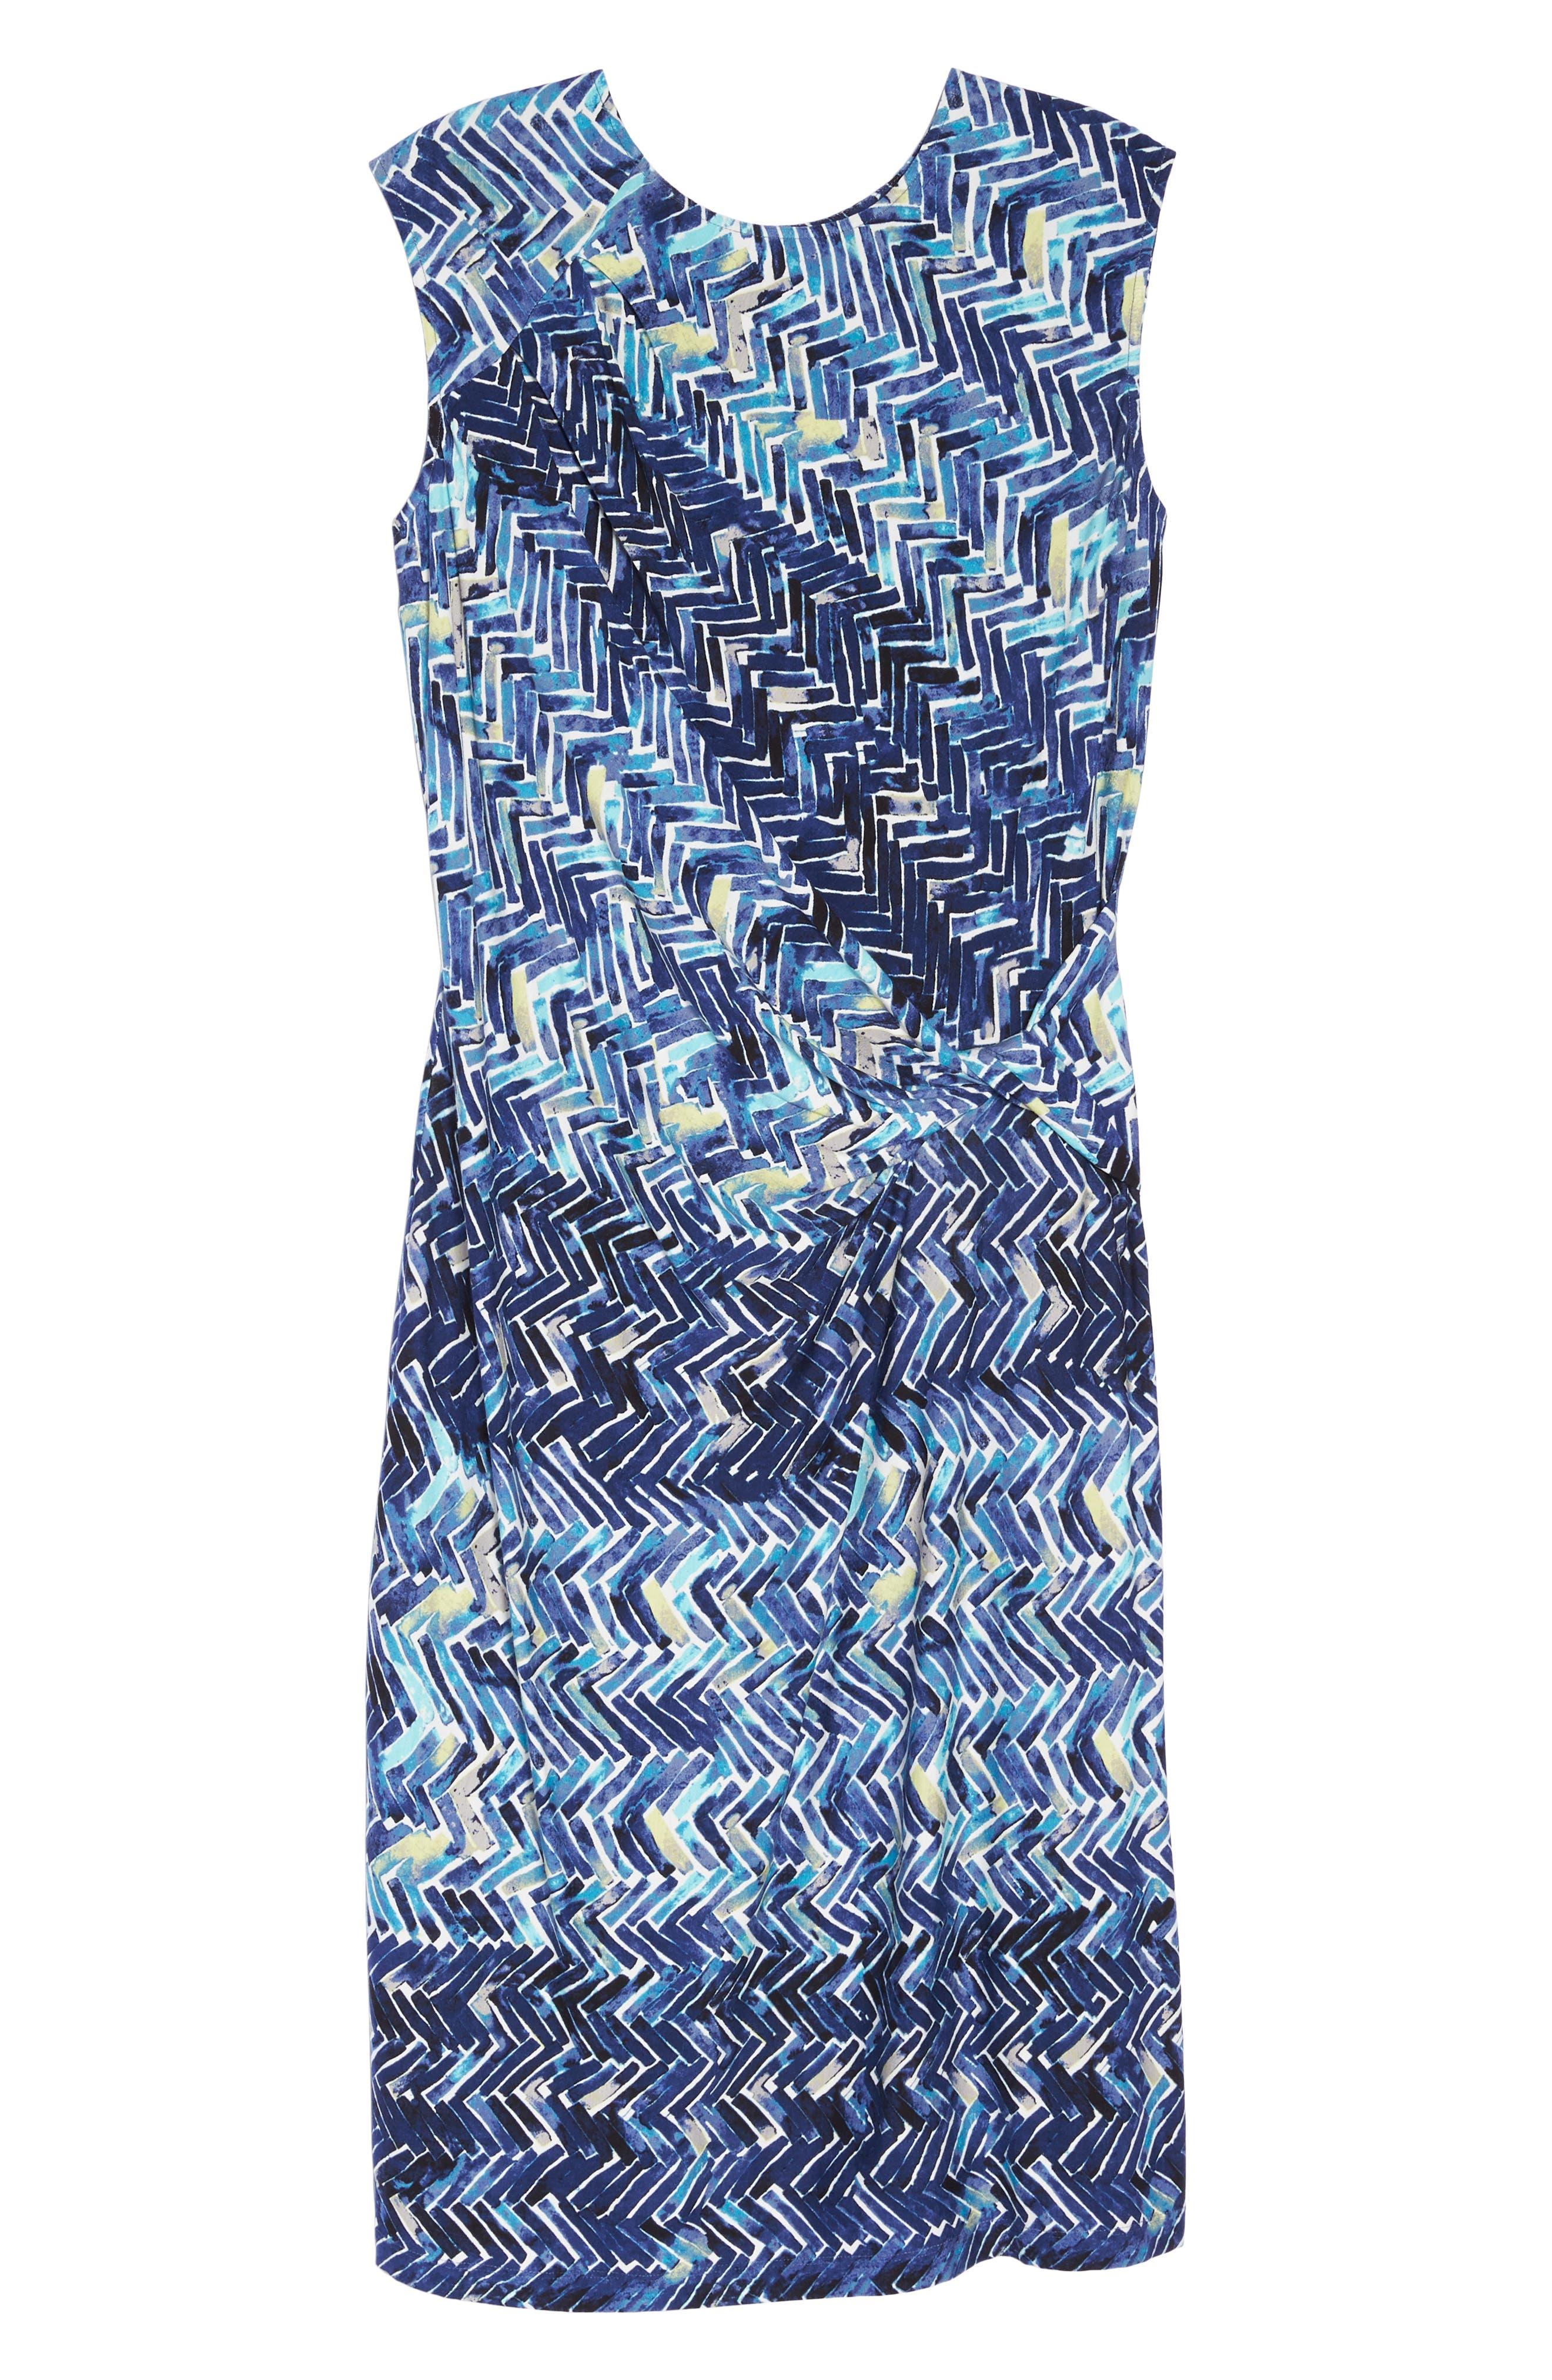 Seaside Tile Ruched Sheath Dress,                             Alternate thumbnail 7, color,                             Multi